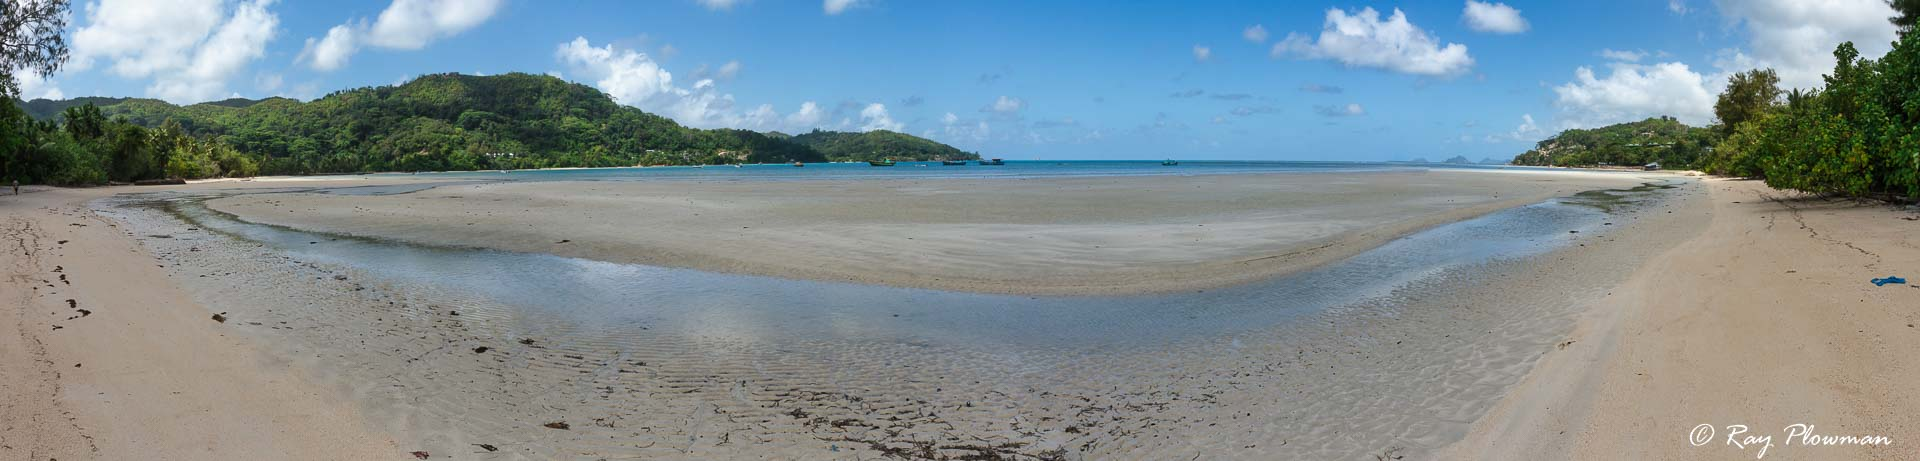 Seychelles South and West Mahé Landscapes